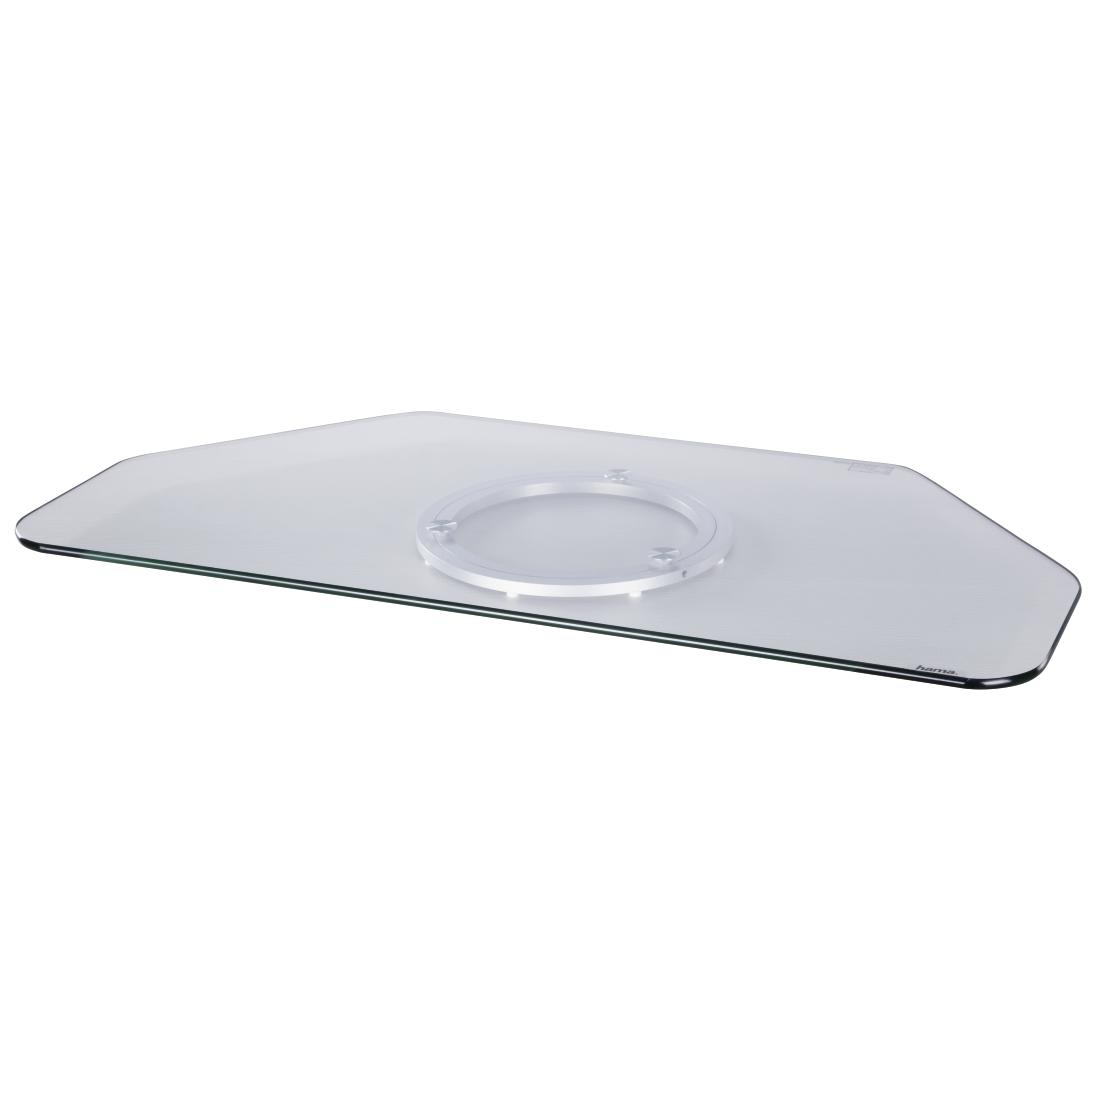 00084028 hama tv drehteller glas klar hama de. Black Bedroom Furniture Sets. Home Design Ideas